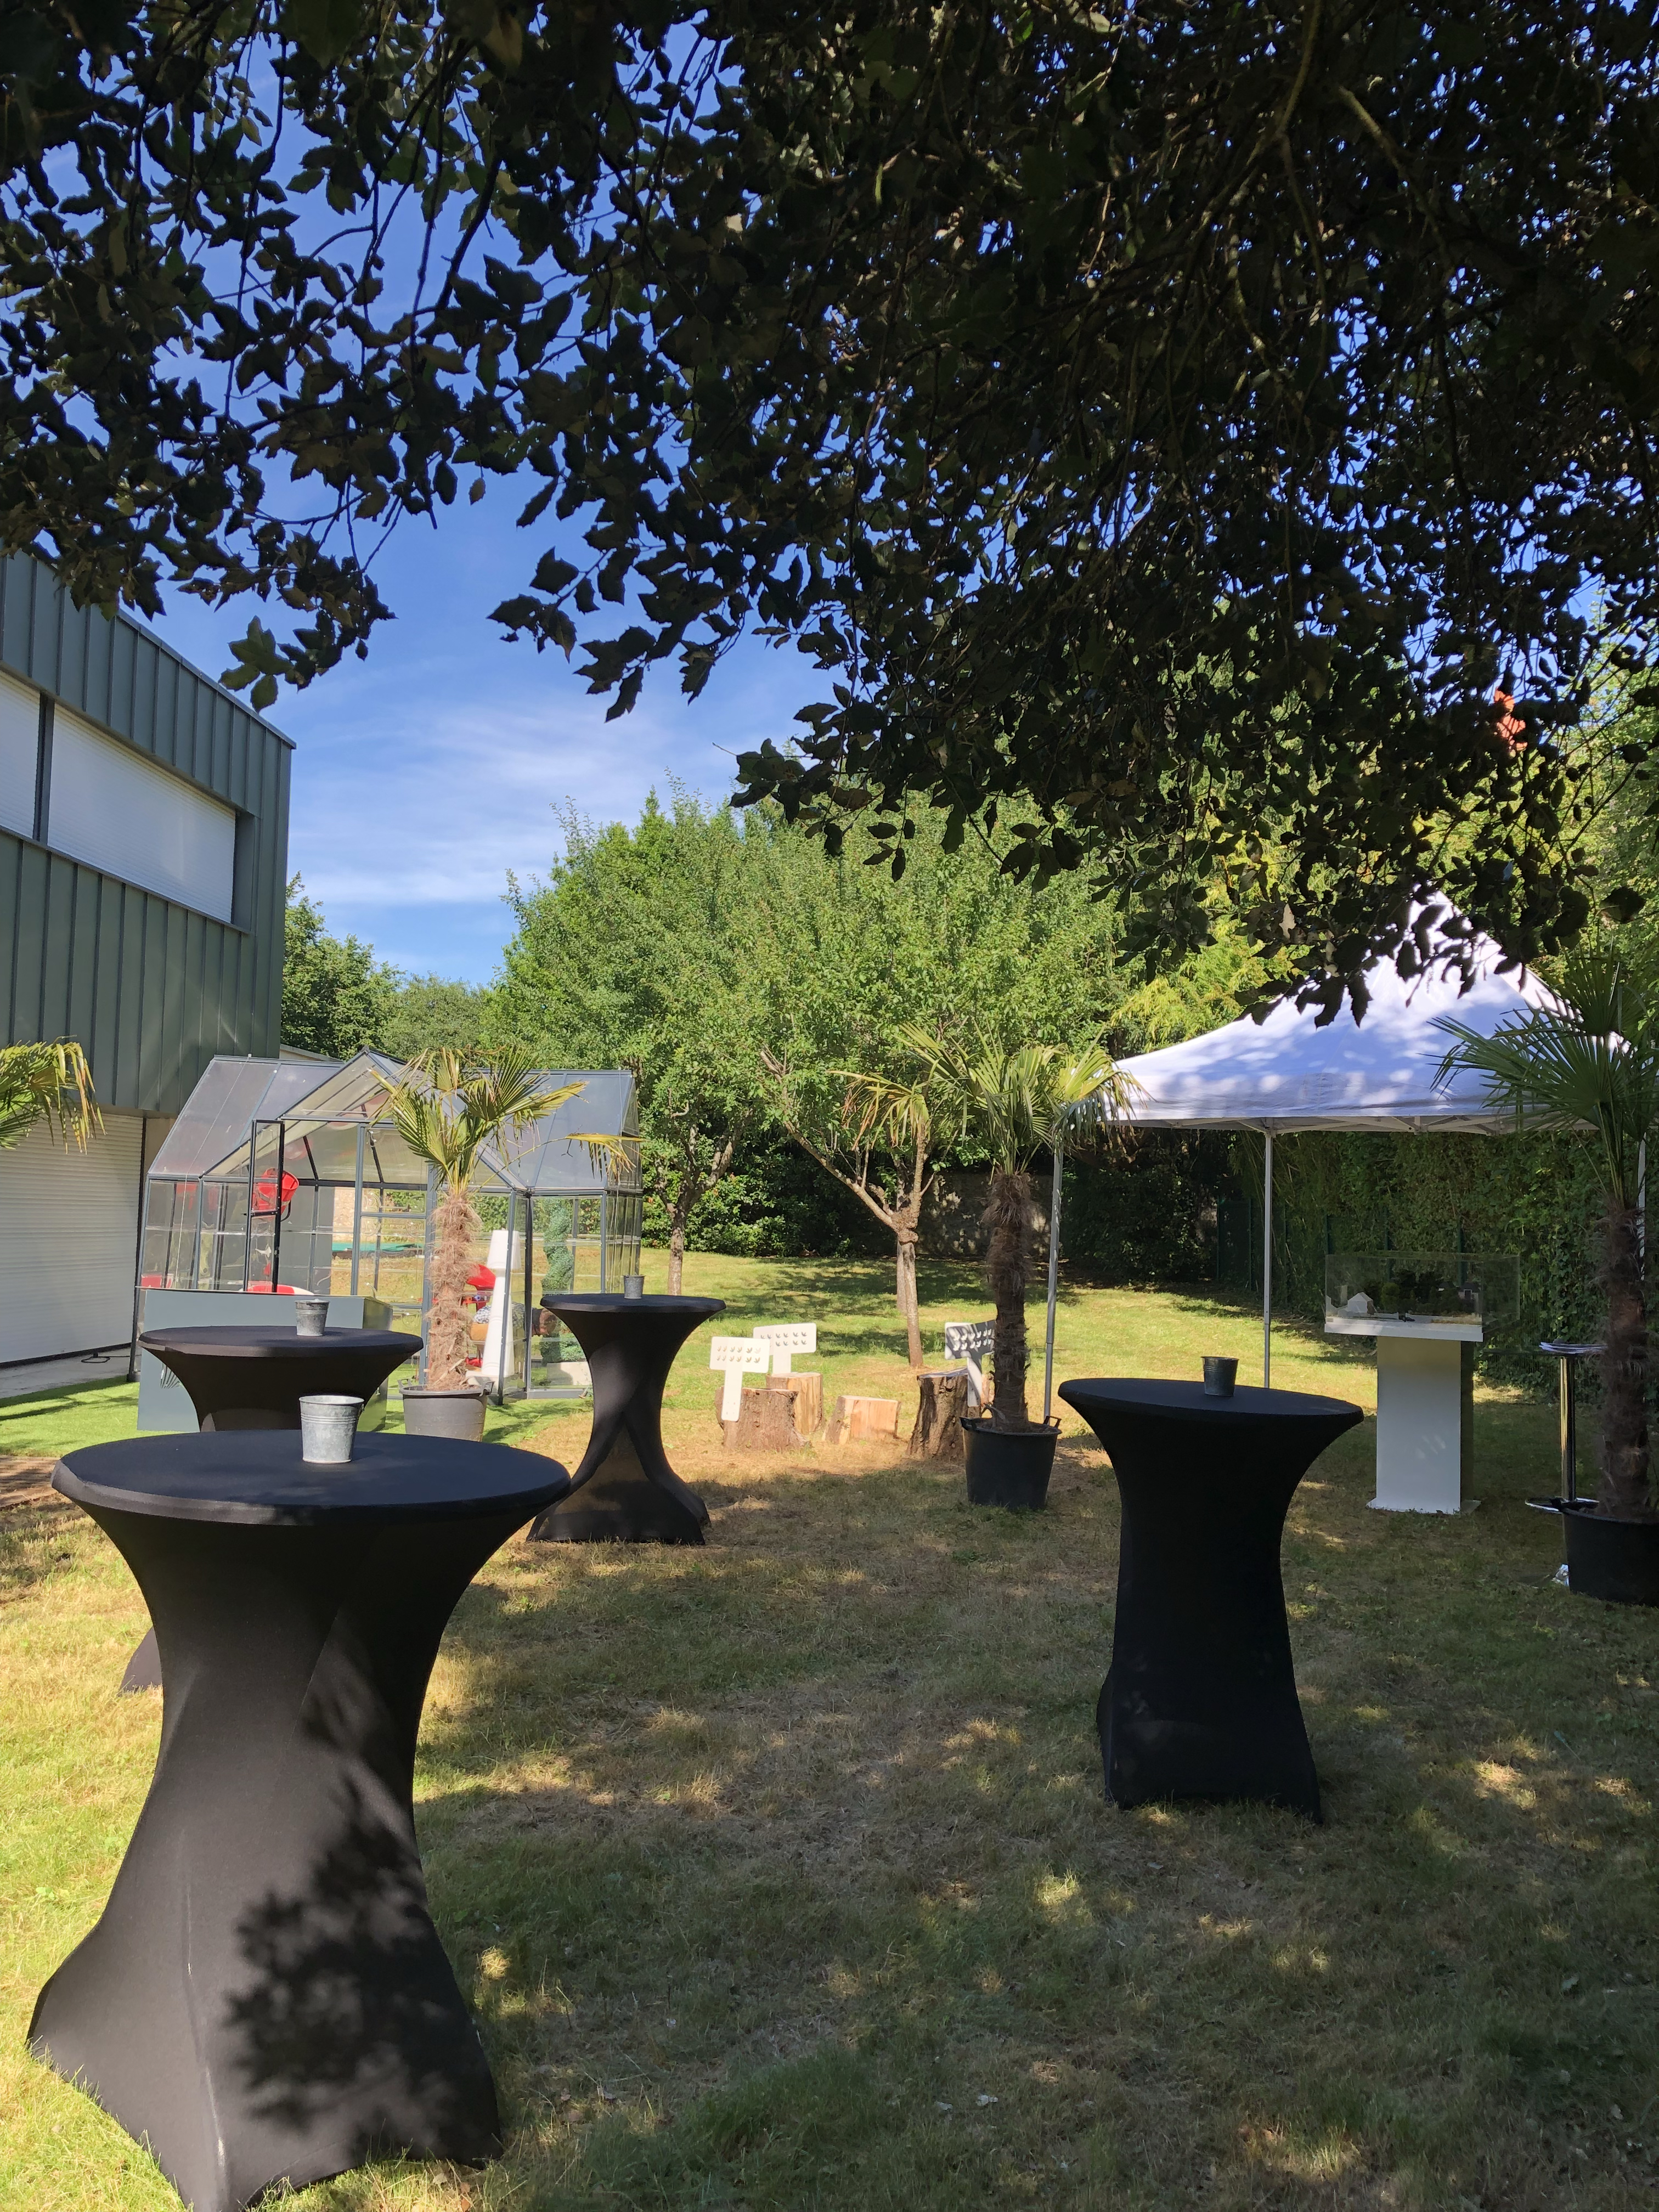 La Garden Party du Groupe Gambetta